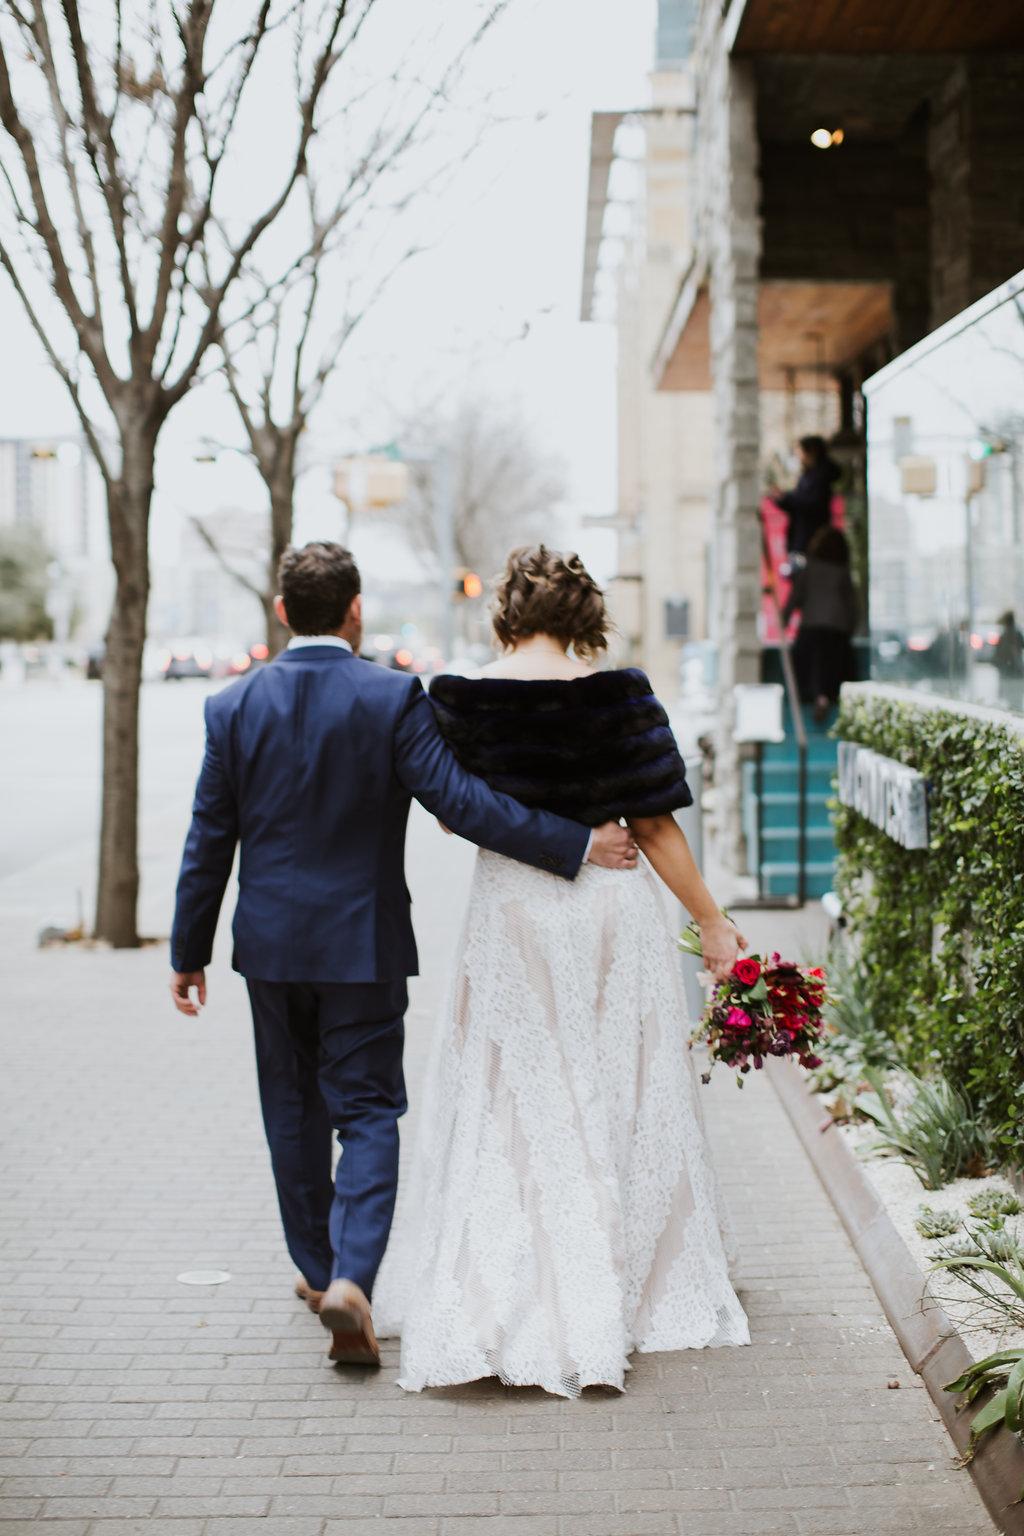 Paige-Newton-Intimate-Wedding-Photographer-Malverde-Wedding-Photography0031.jpg